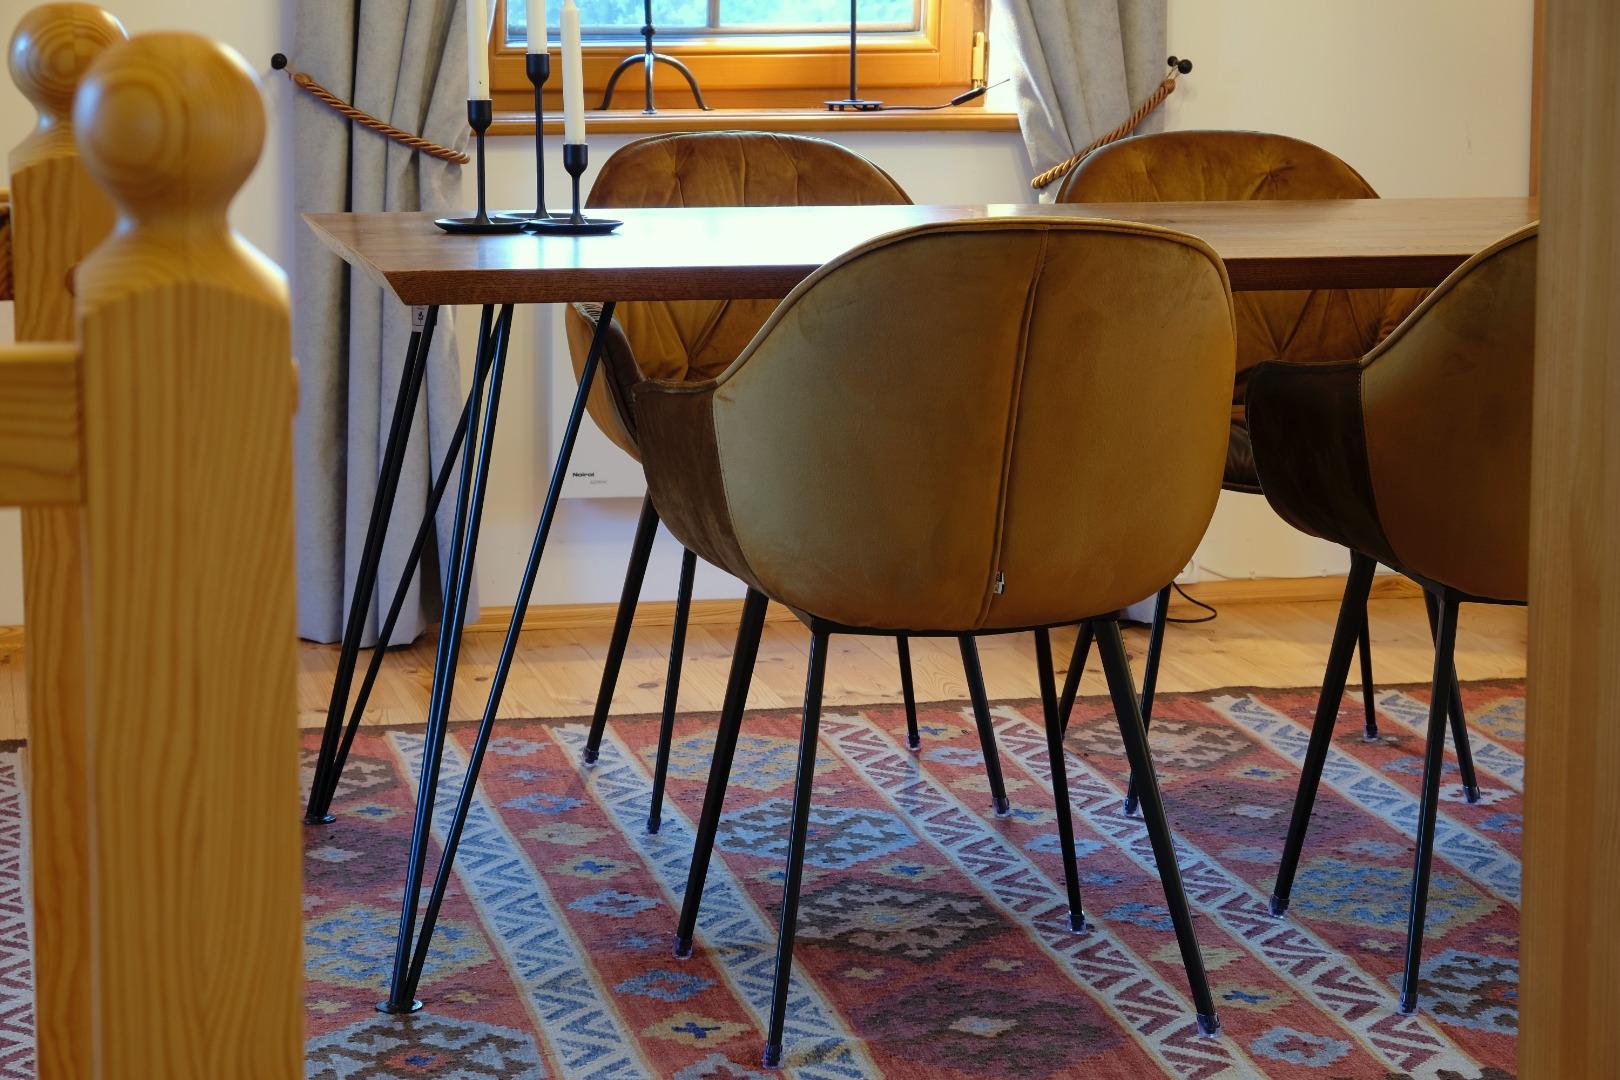 Stół na nodze Hairpin legs #6